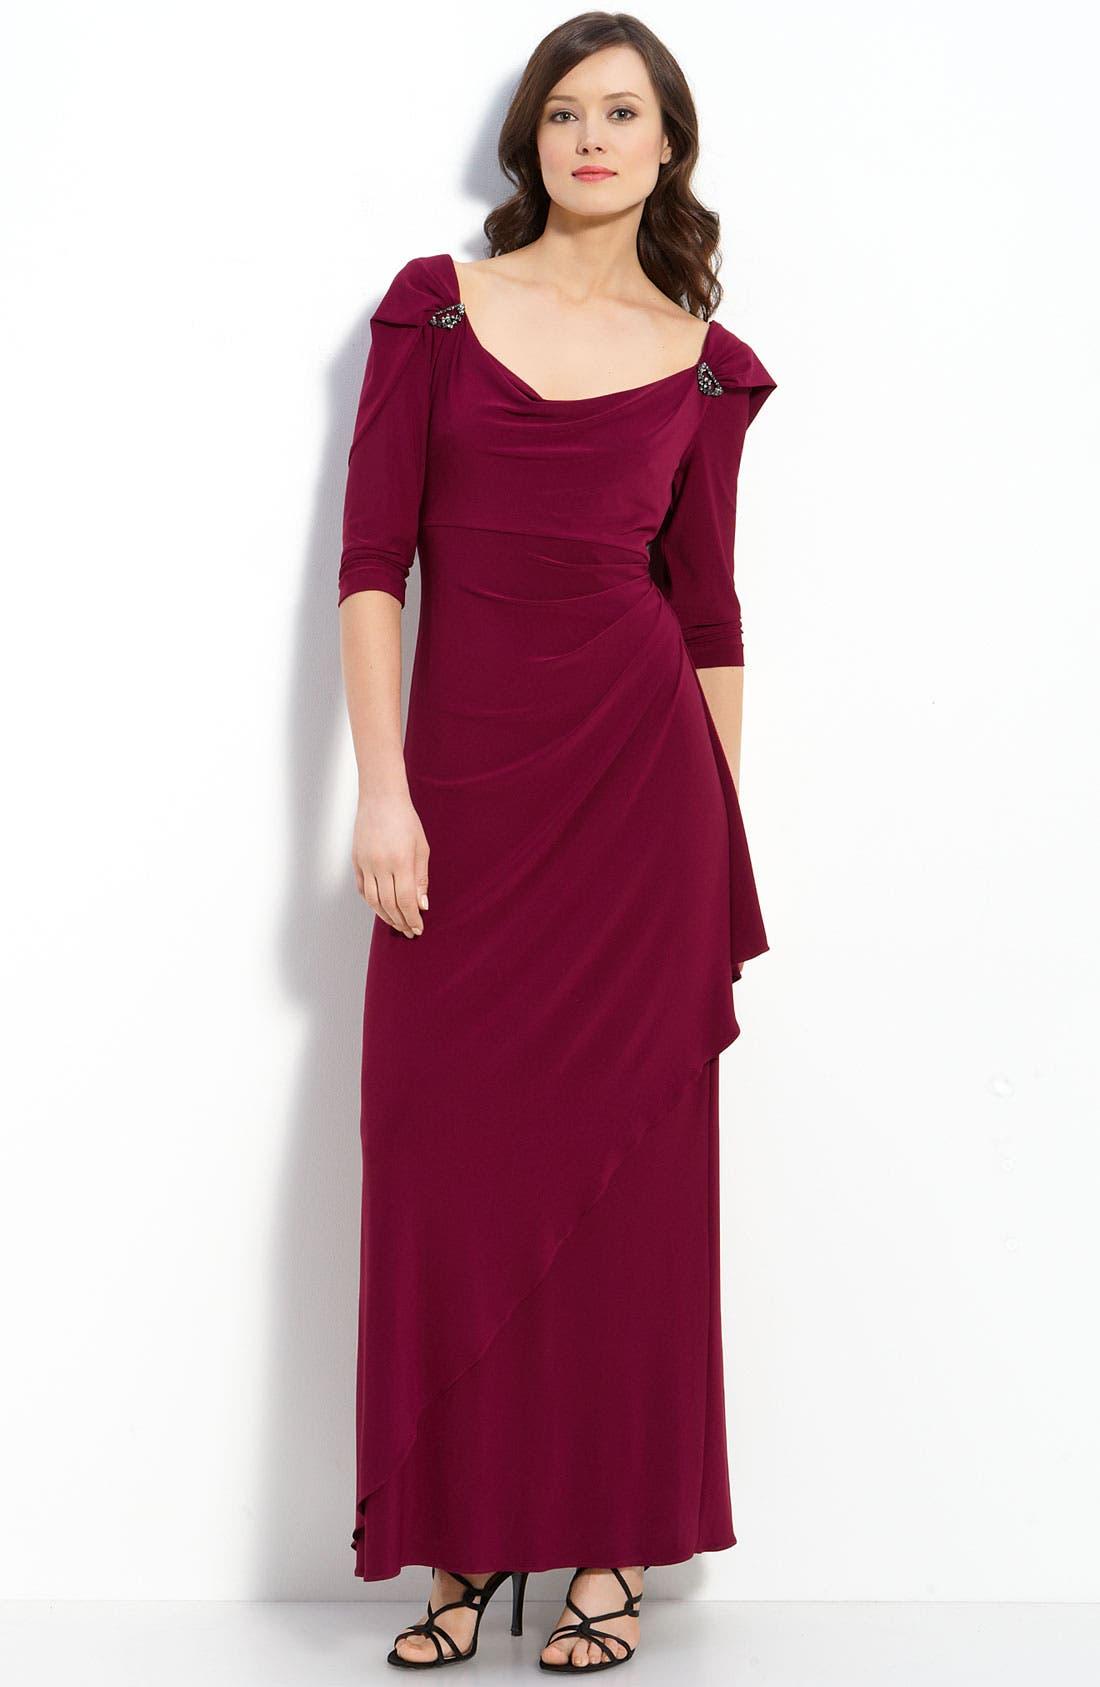 Alternate Image 1 Selected - Alex Evenings Drape Back Jersey Gown (Petite)